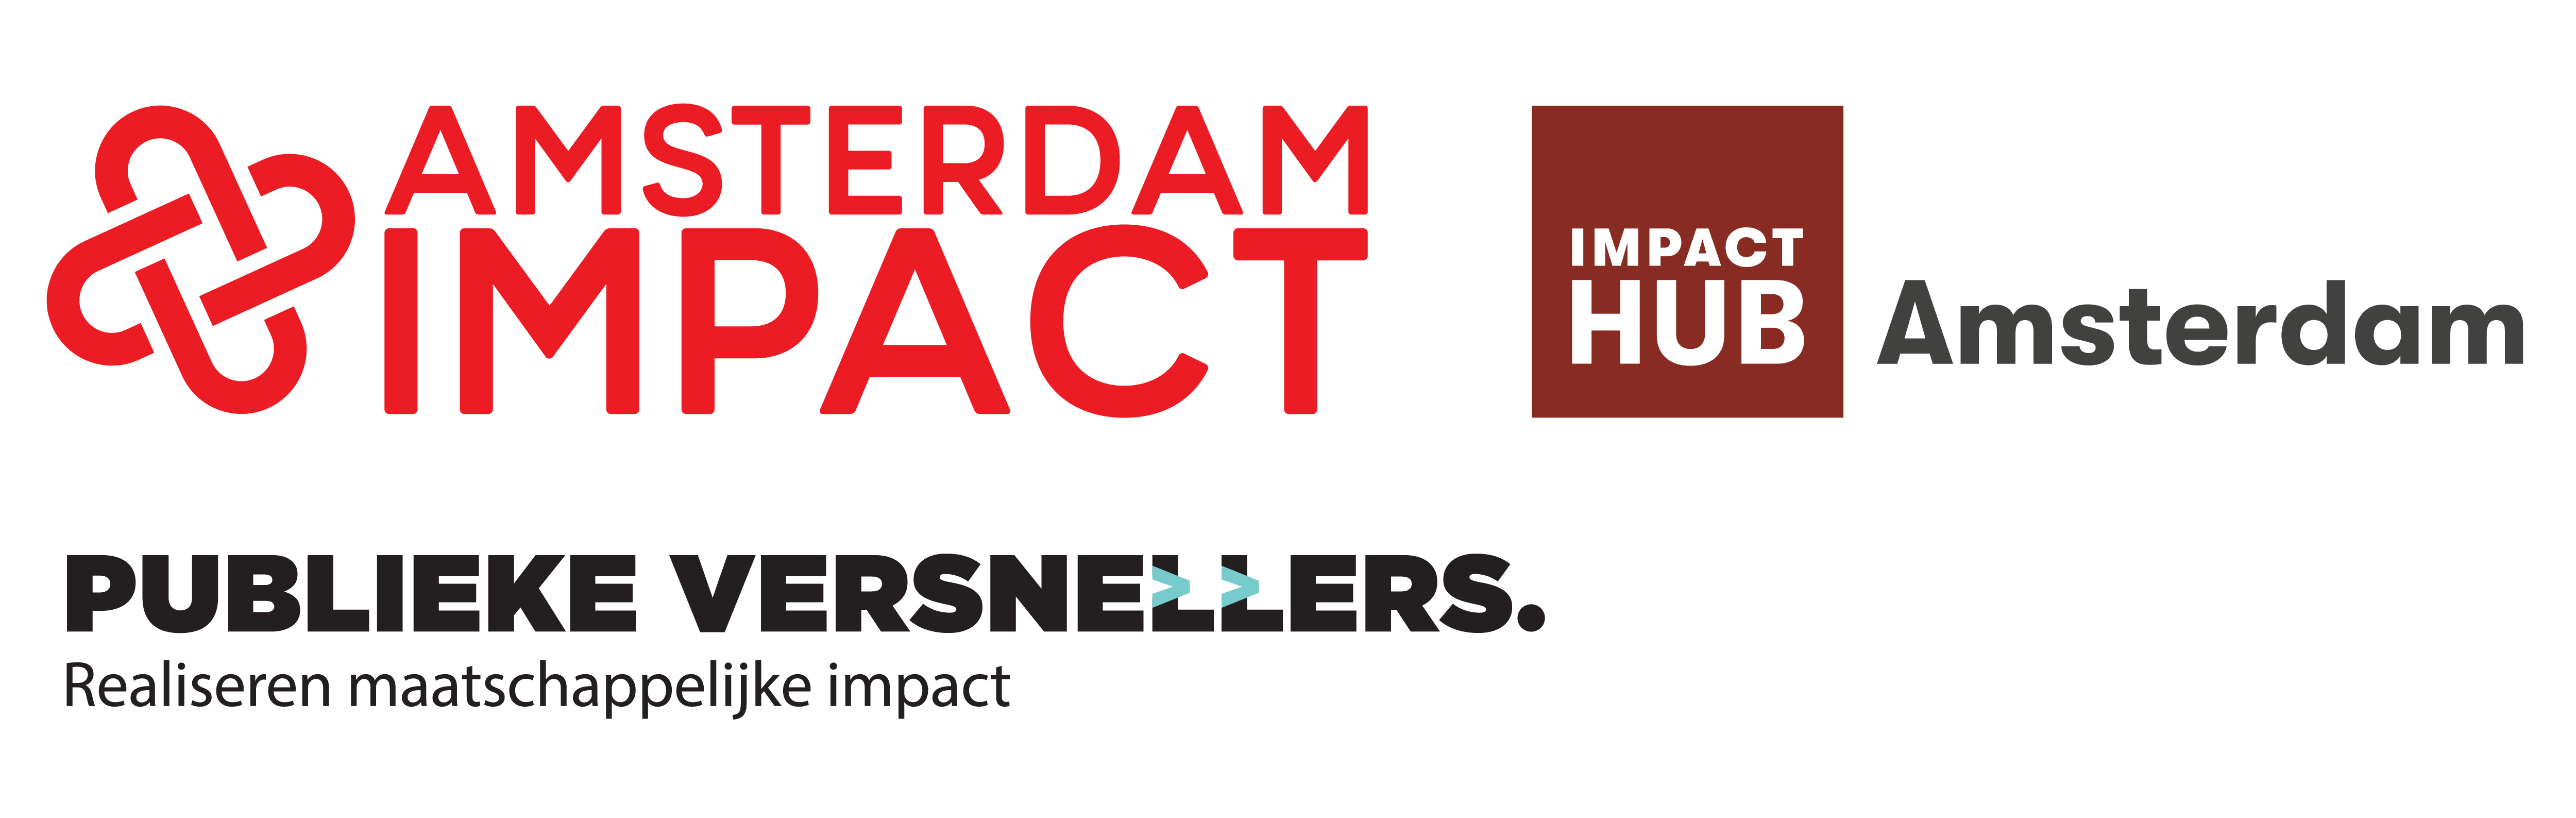 sdgs amsterdam challenge